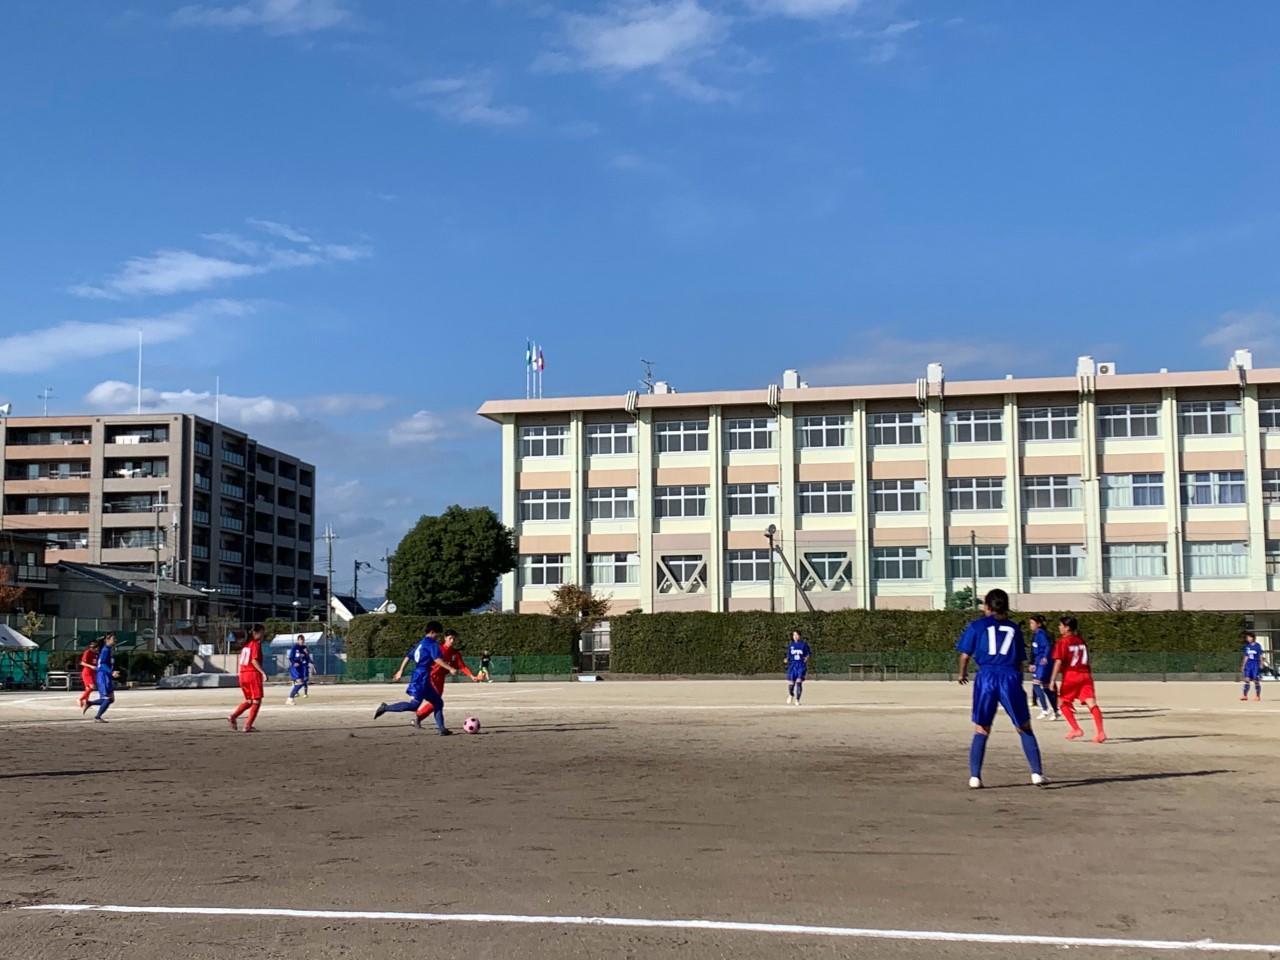 http://www.kyoto-be.ne.jp/kouyou-hs/mt/school_life/images/%E5%90%91%E9%99%BDVS%E7%A4%BE.jpg